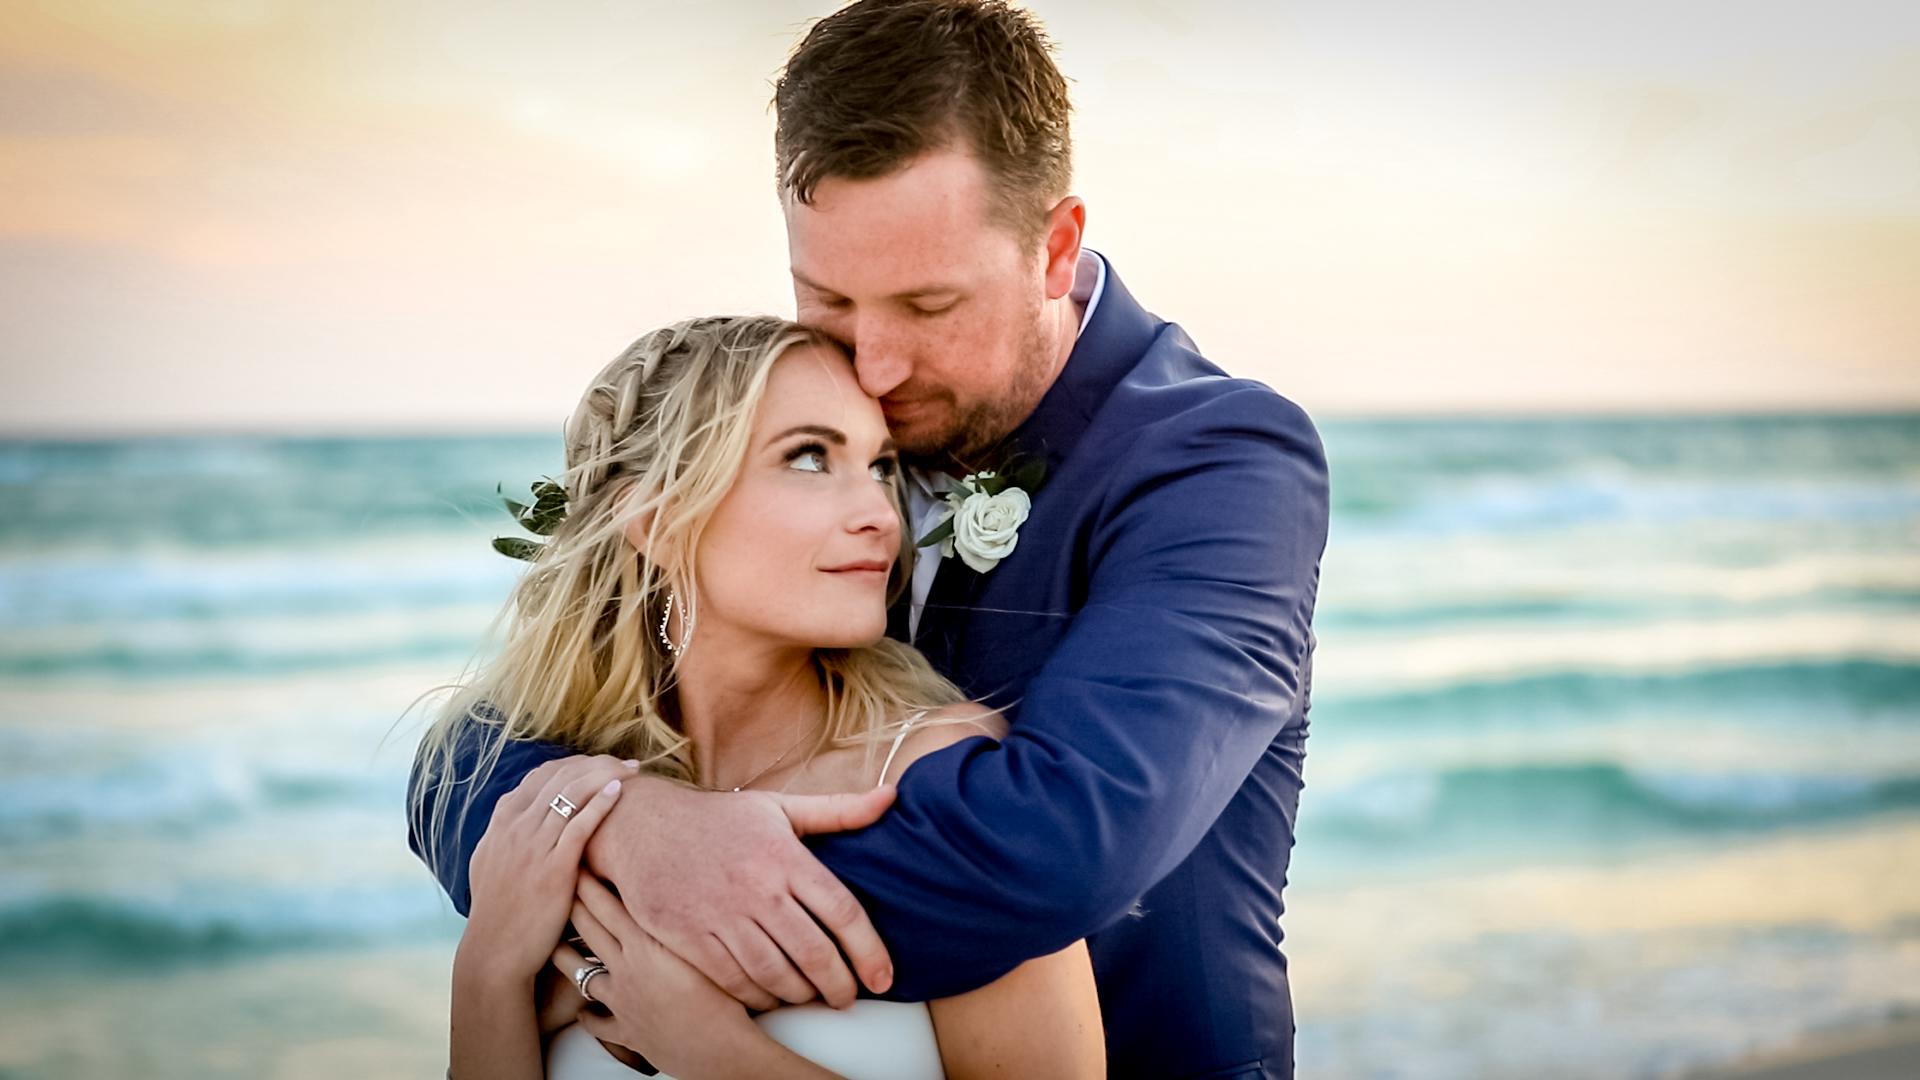 bride and groom wedding portraits on the beach in Seaside, Florida